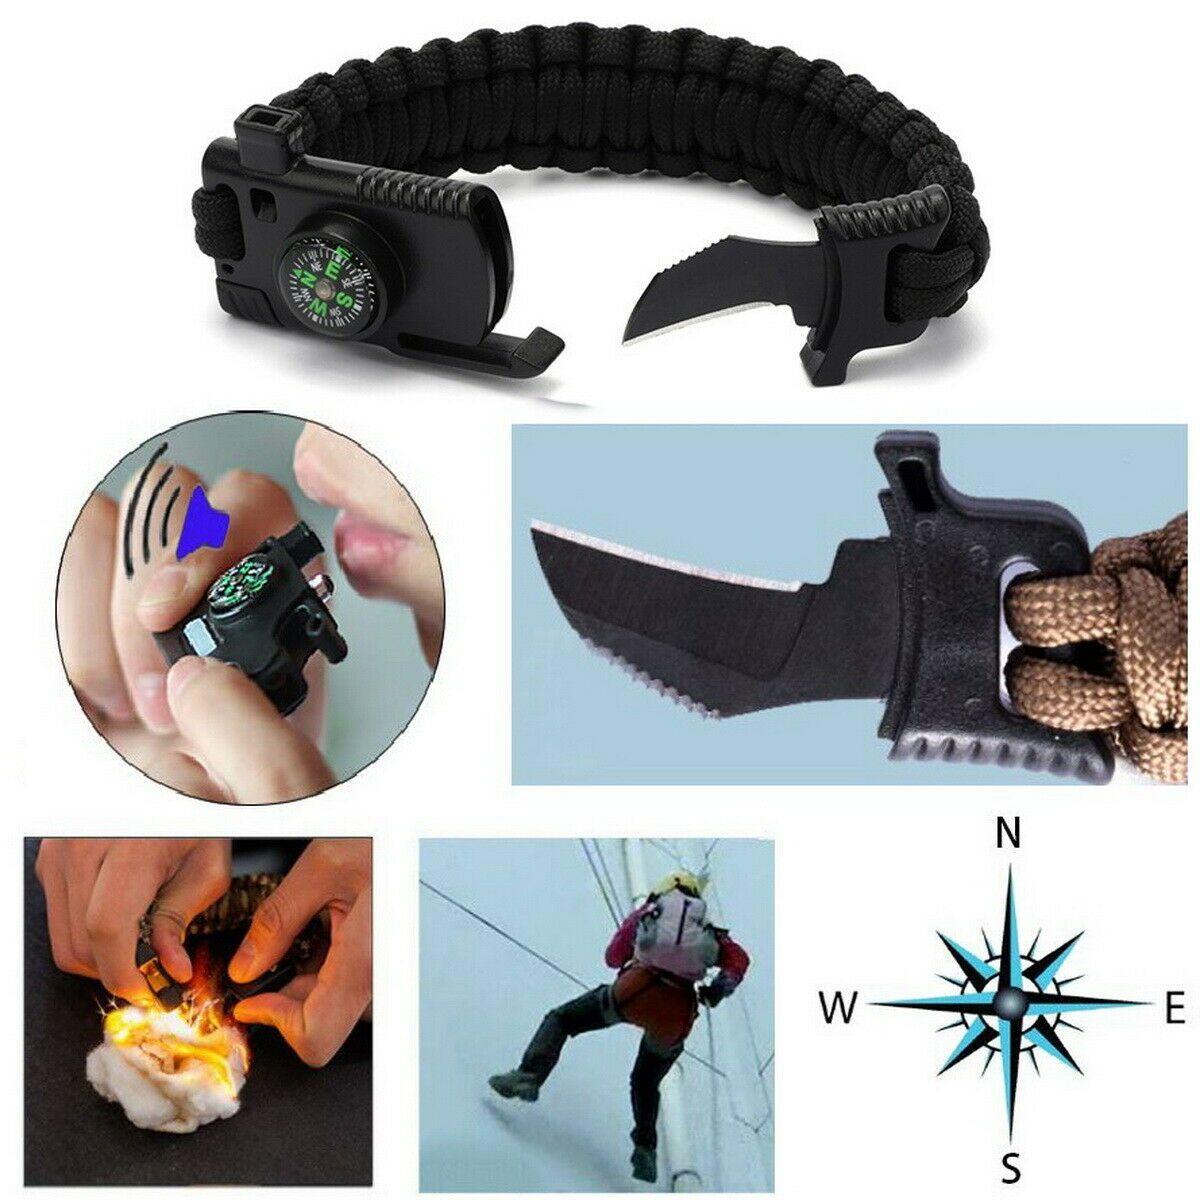 5 In 1 Paracord Survival Gear Emergency Bracelet Whistle Fire